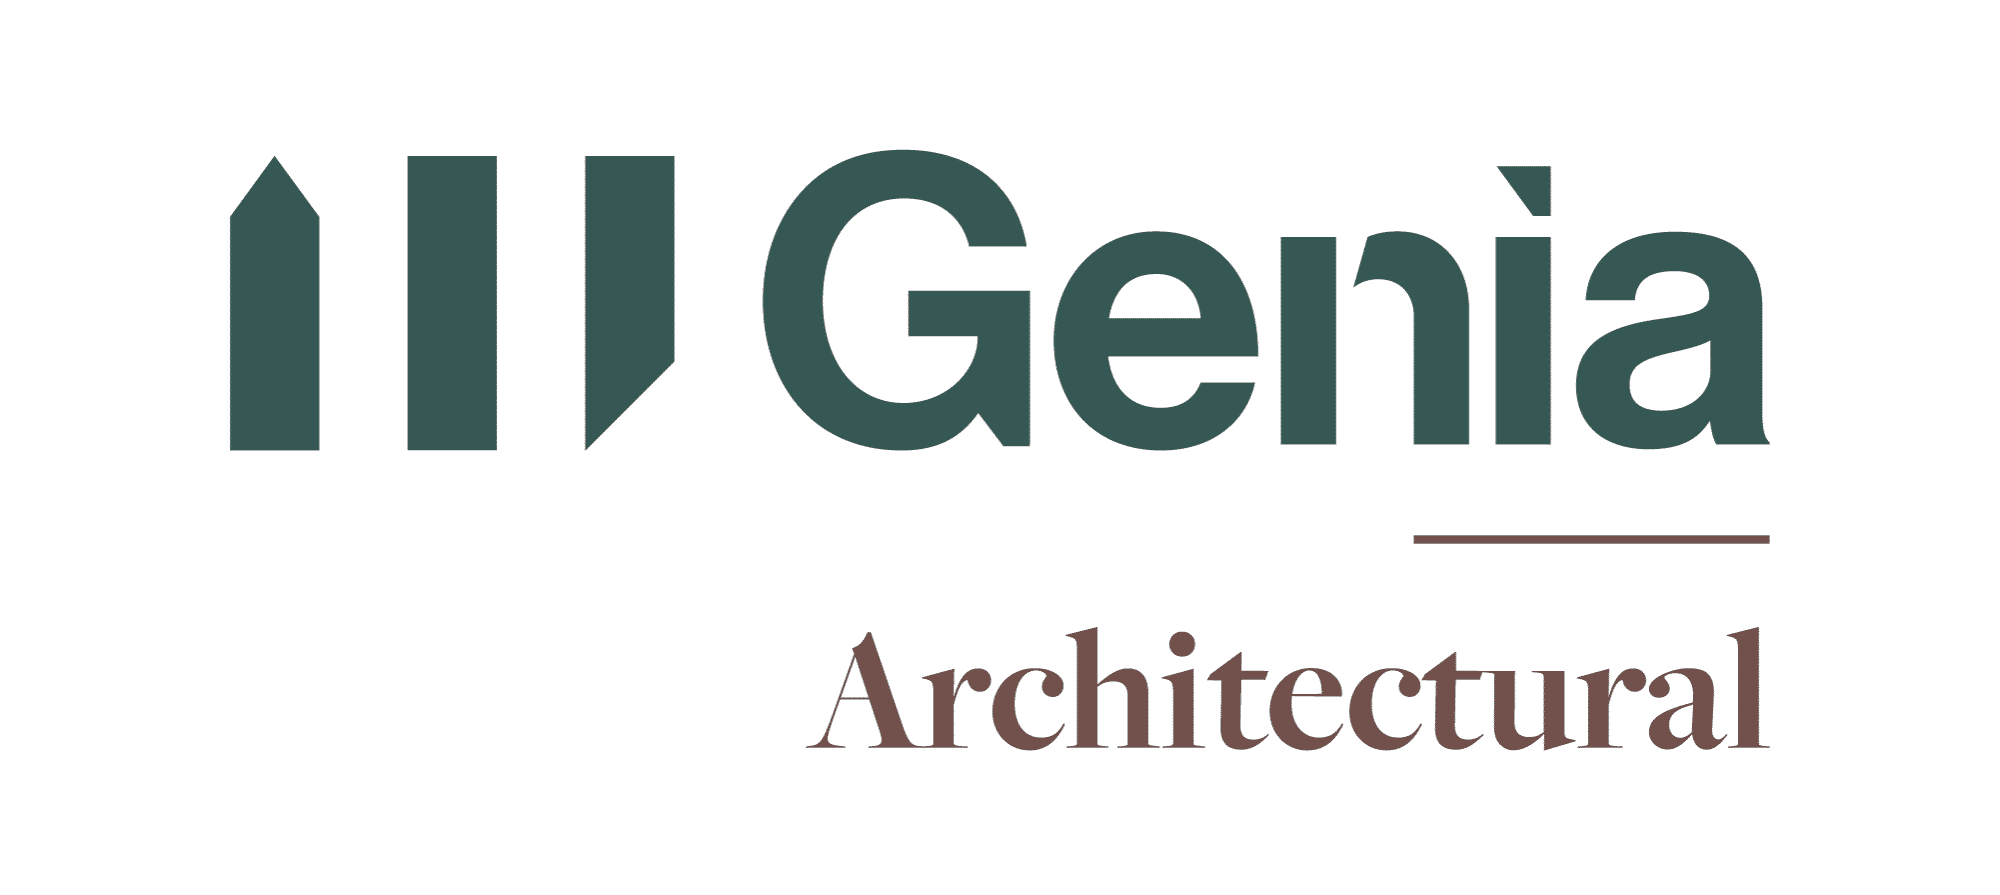 genia-architectural-logo-green-rgb